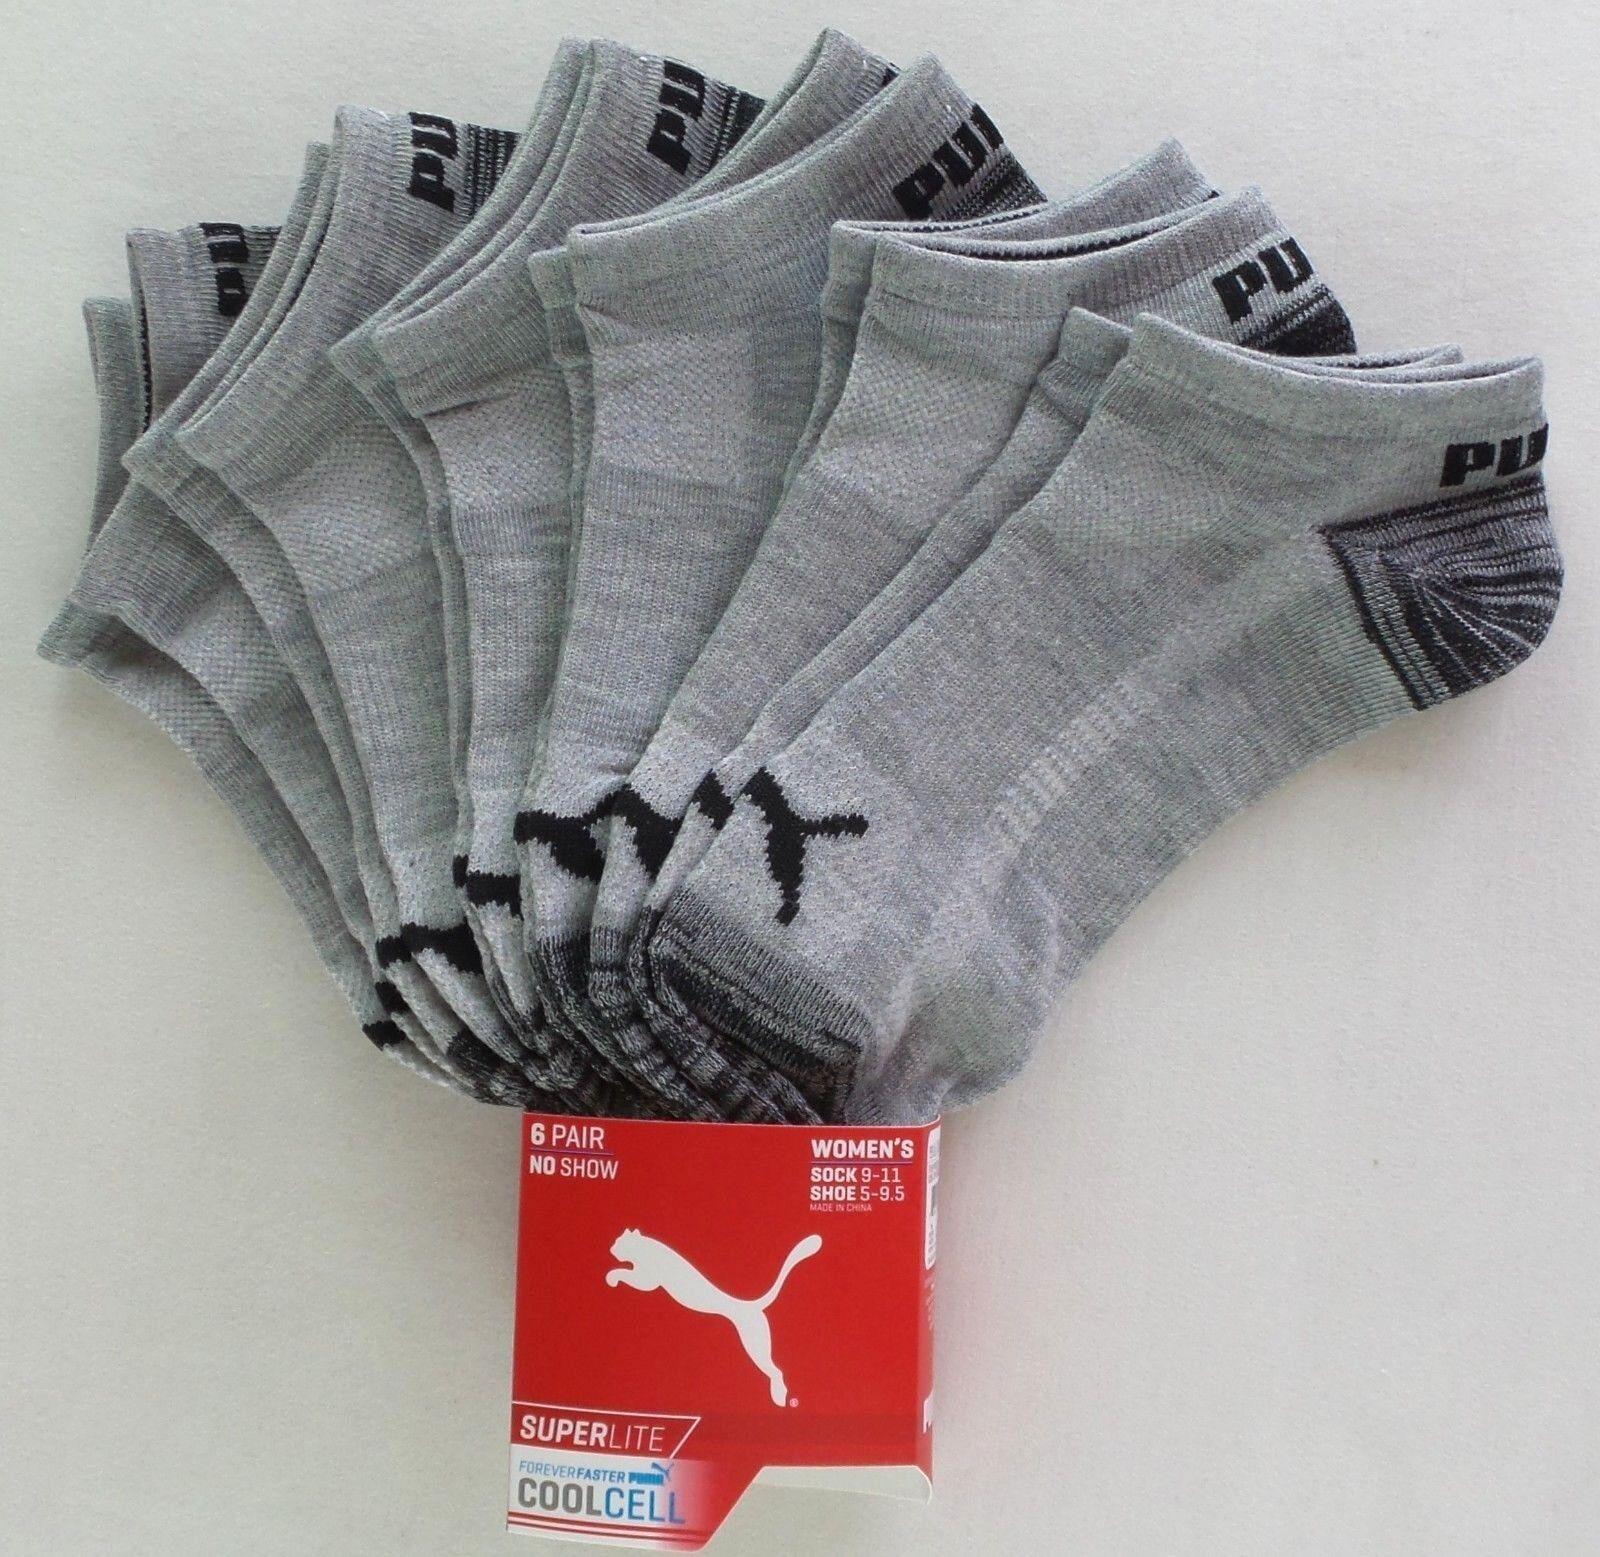 Puma Women's No Show Socks 6 Pack 9-11 Grey Black Athletic S